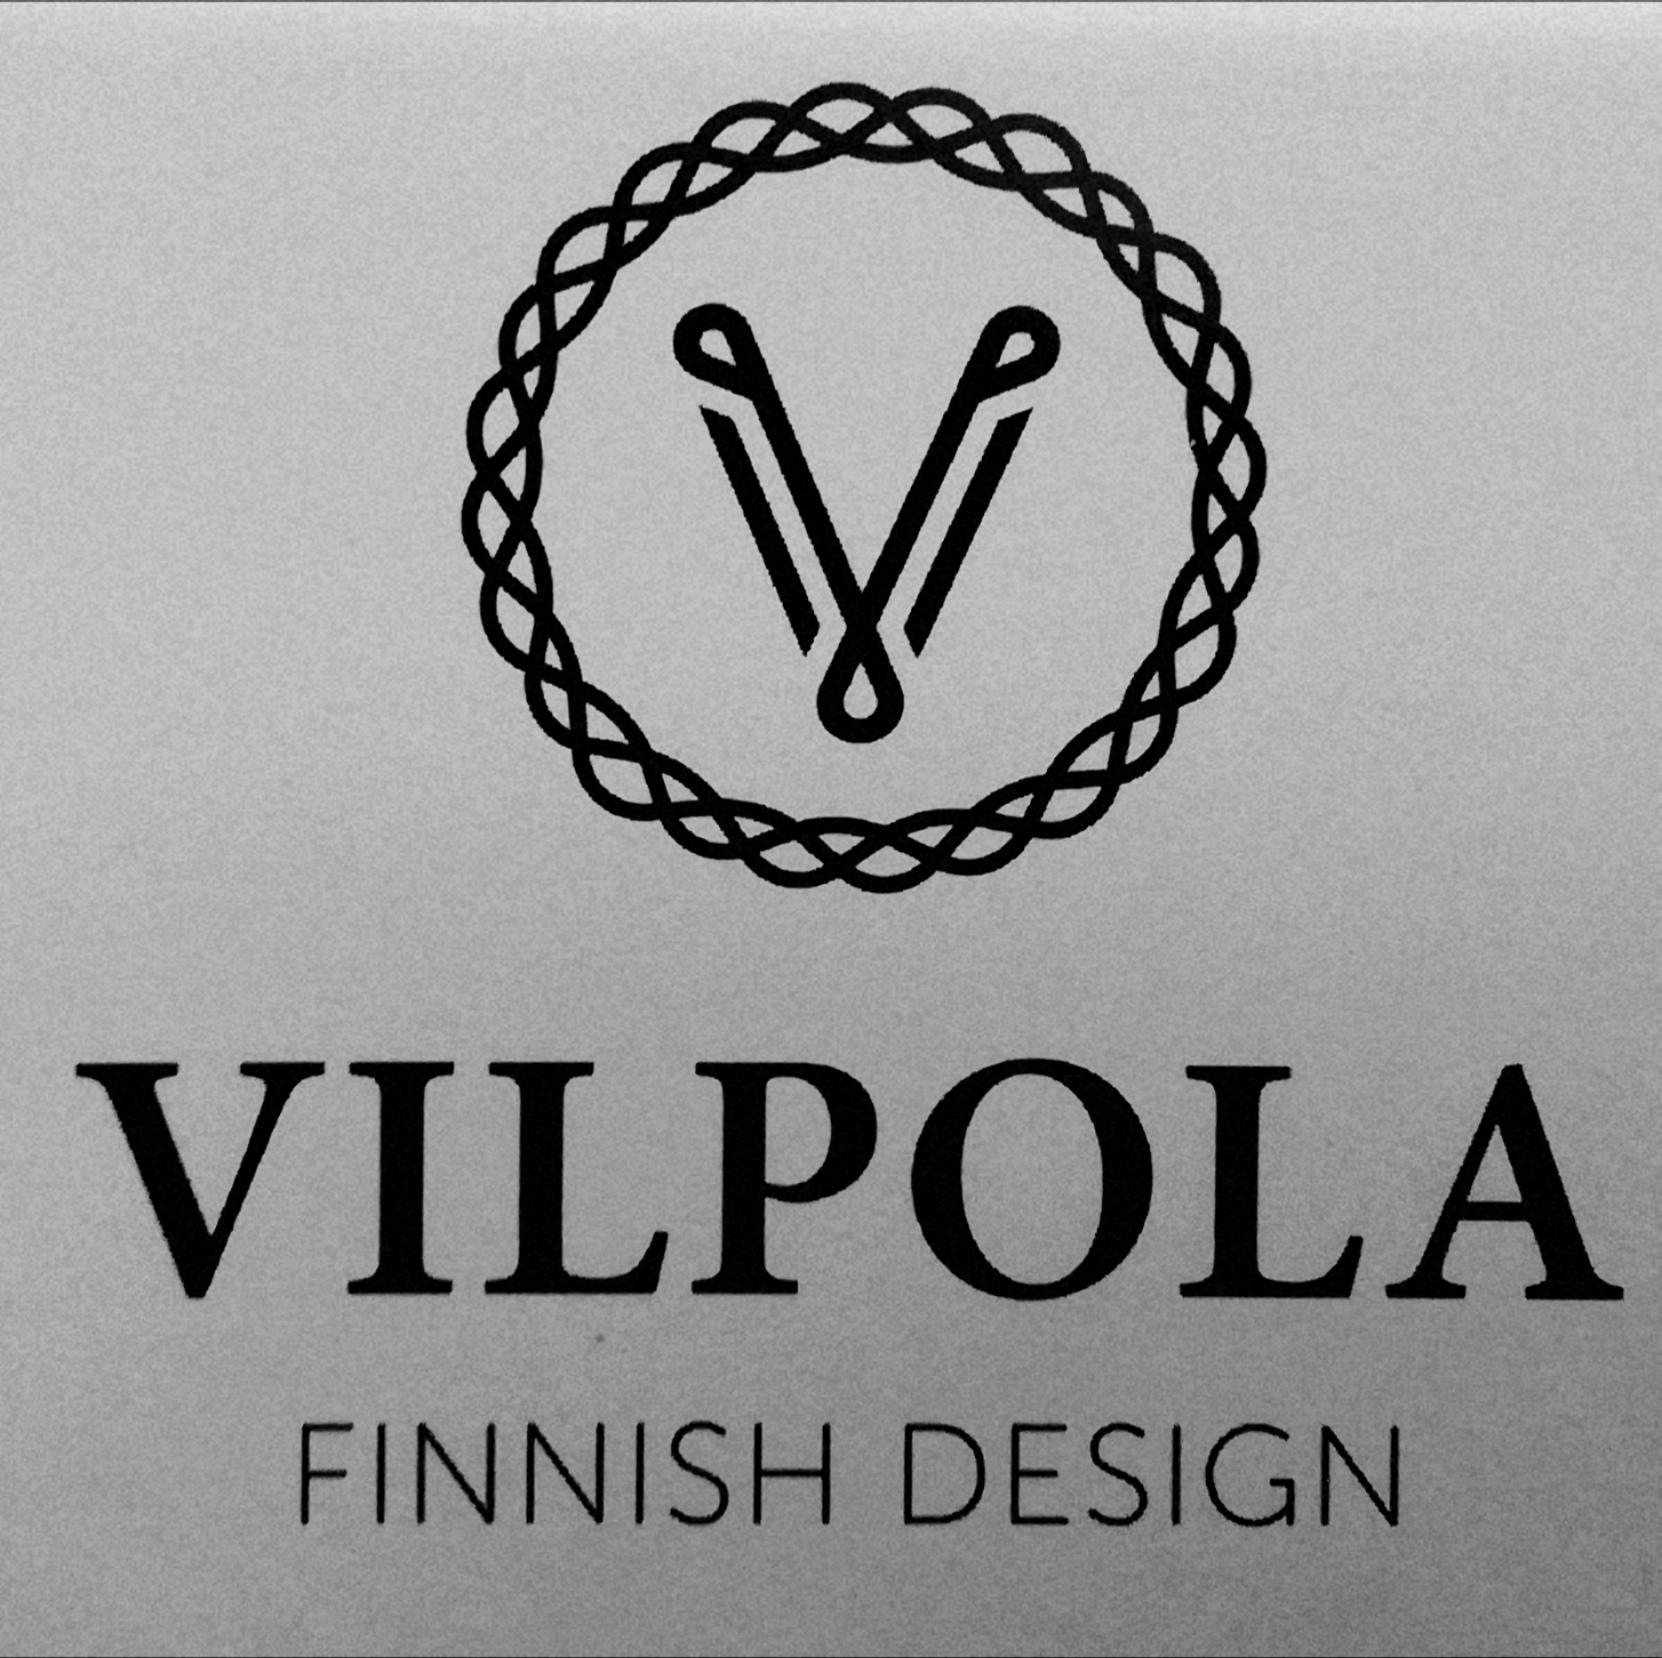 Vilpola Finnish Design